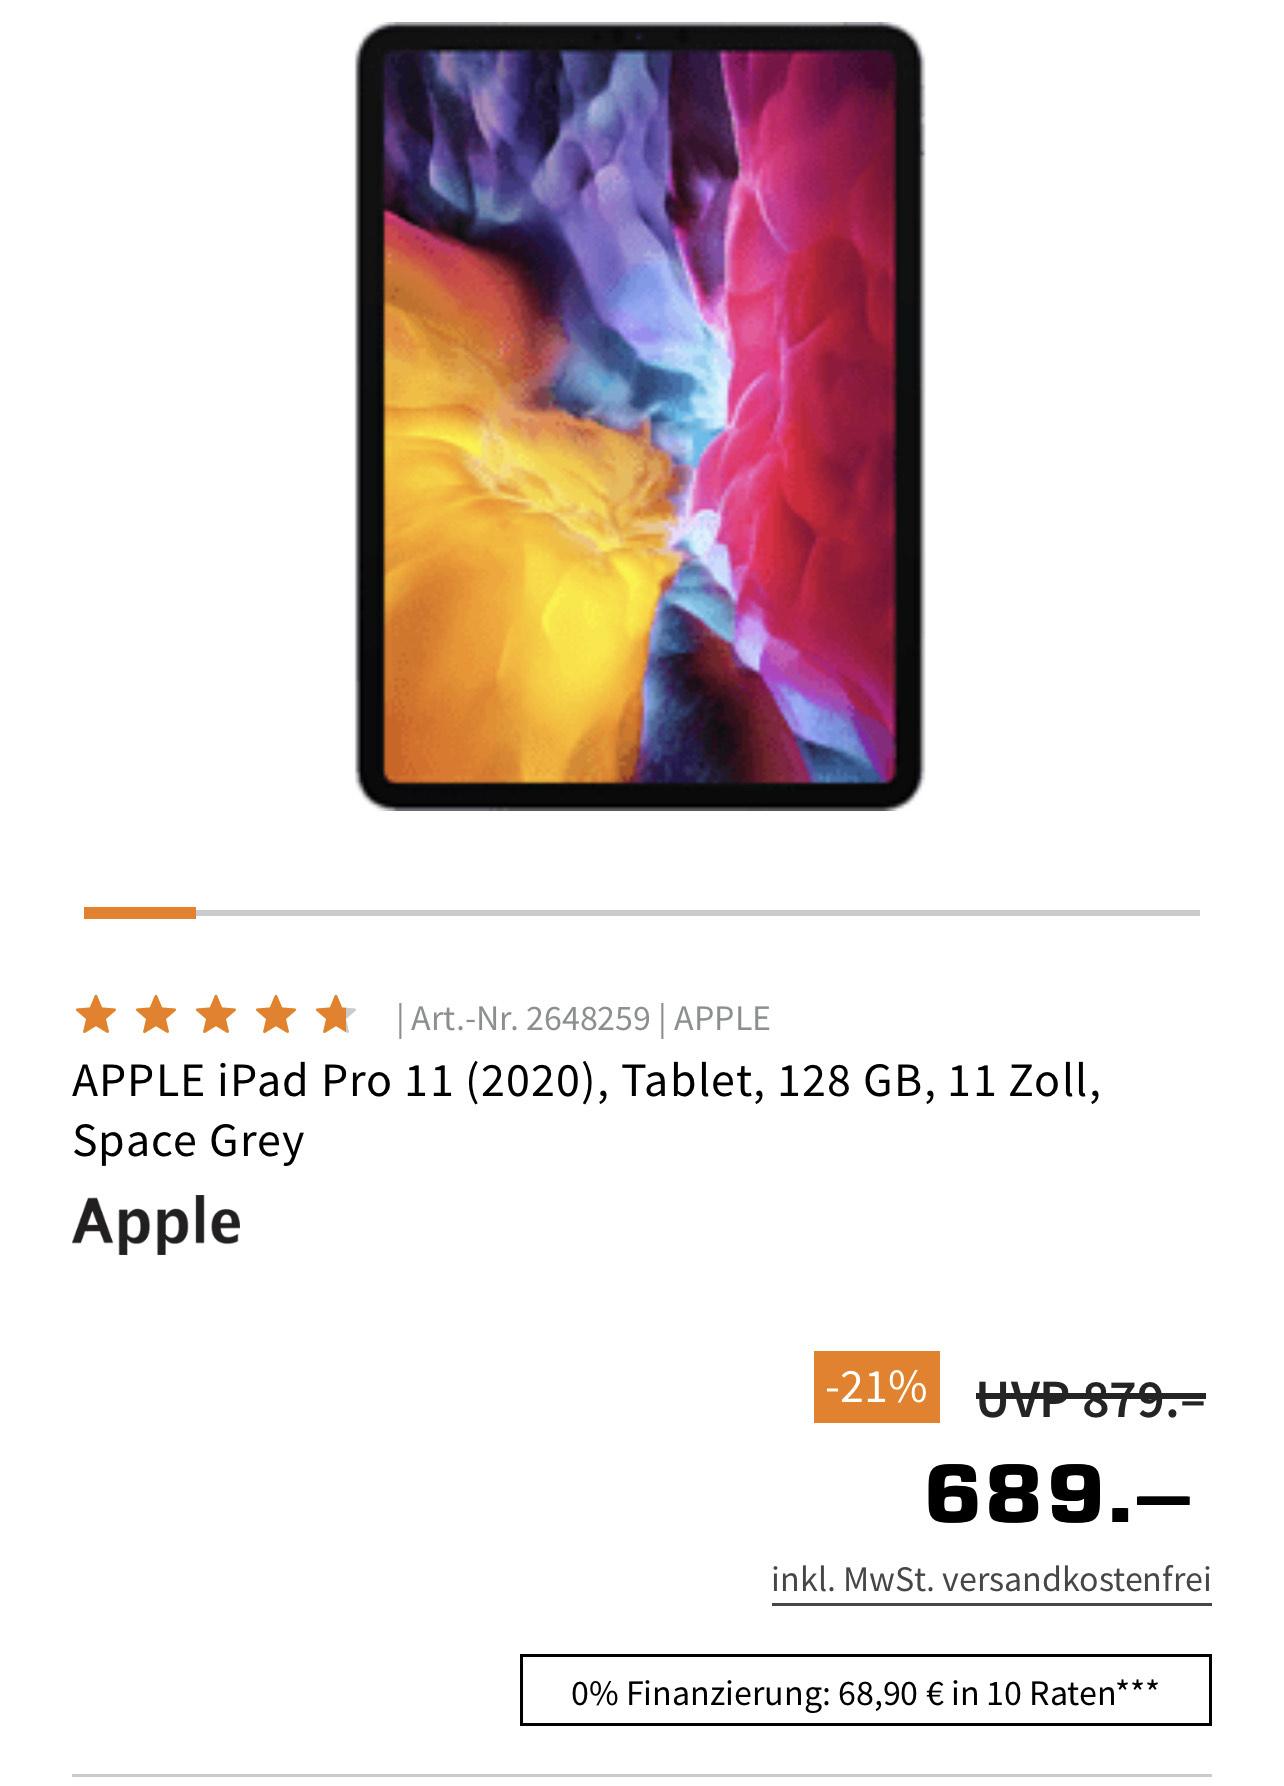 APPLE iPad Pro 11 (2020), Tablet, 128 GB, 11 Zoll, Space Grey